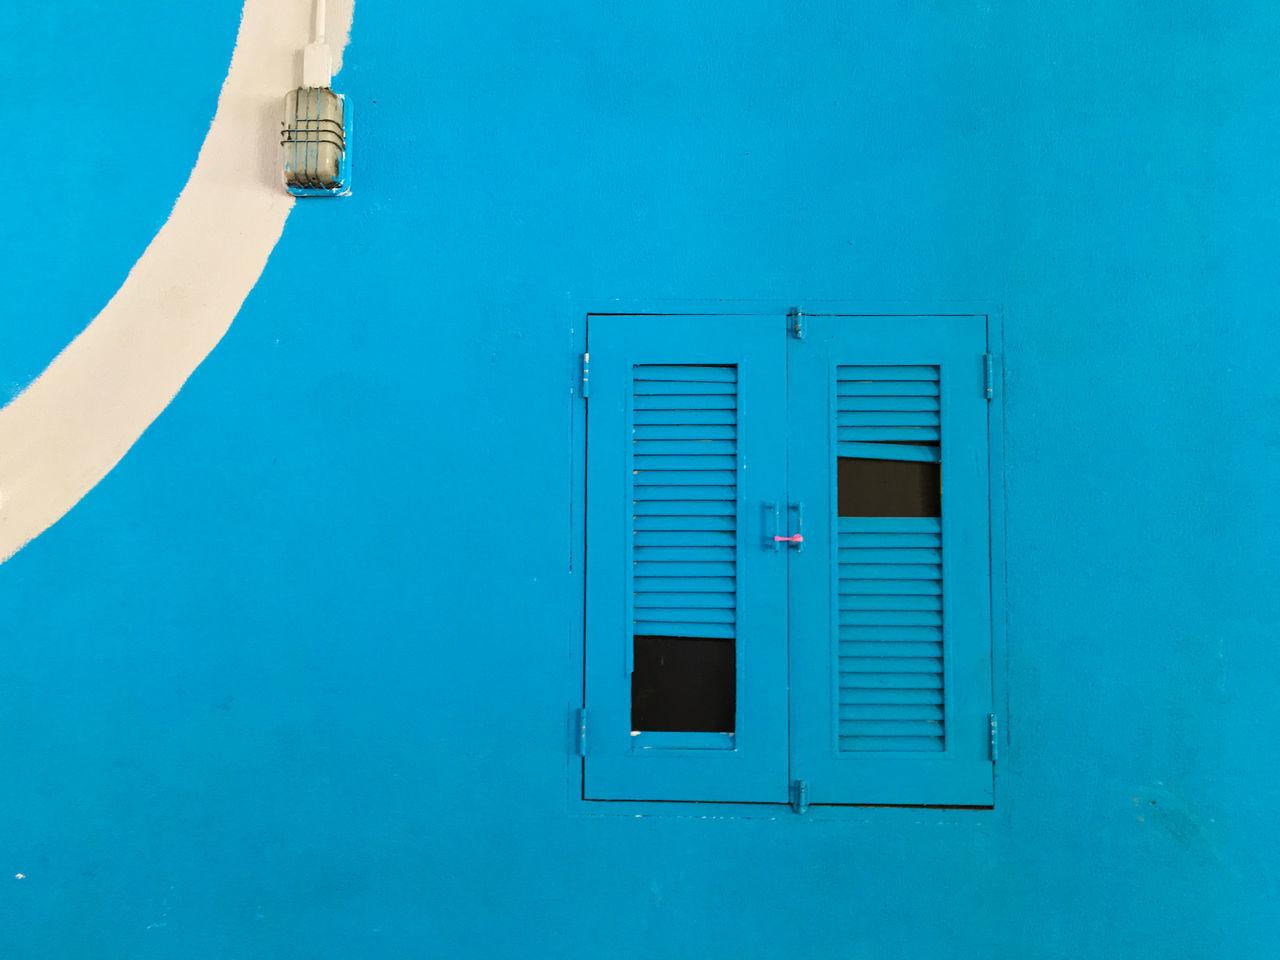 Beautiful stock photos of sicherheit, Architecture, Blue, Broken, Building Exterior